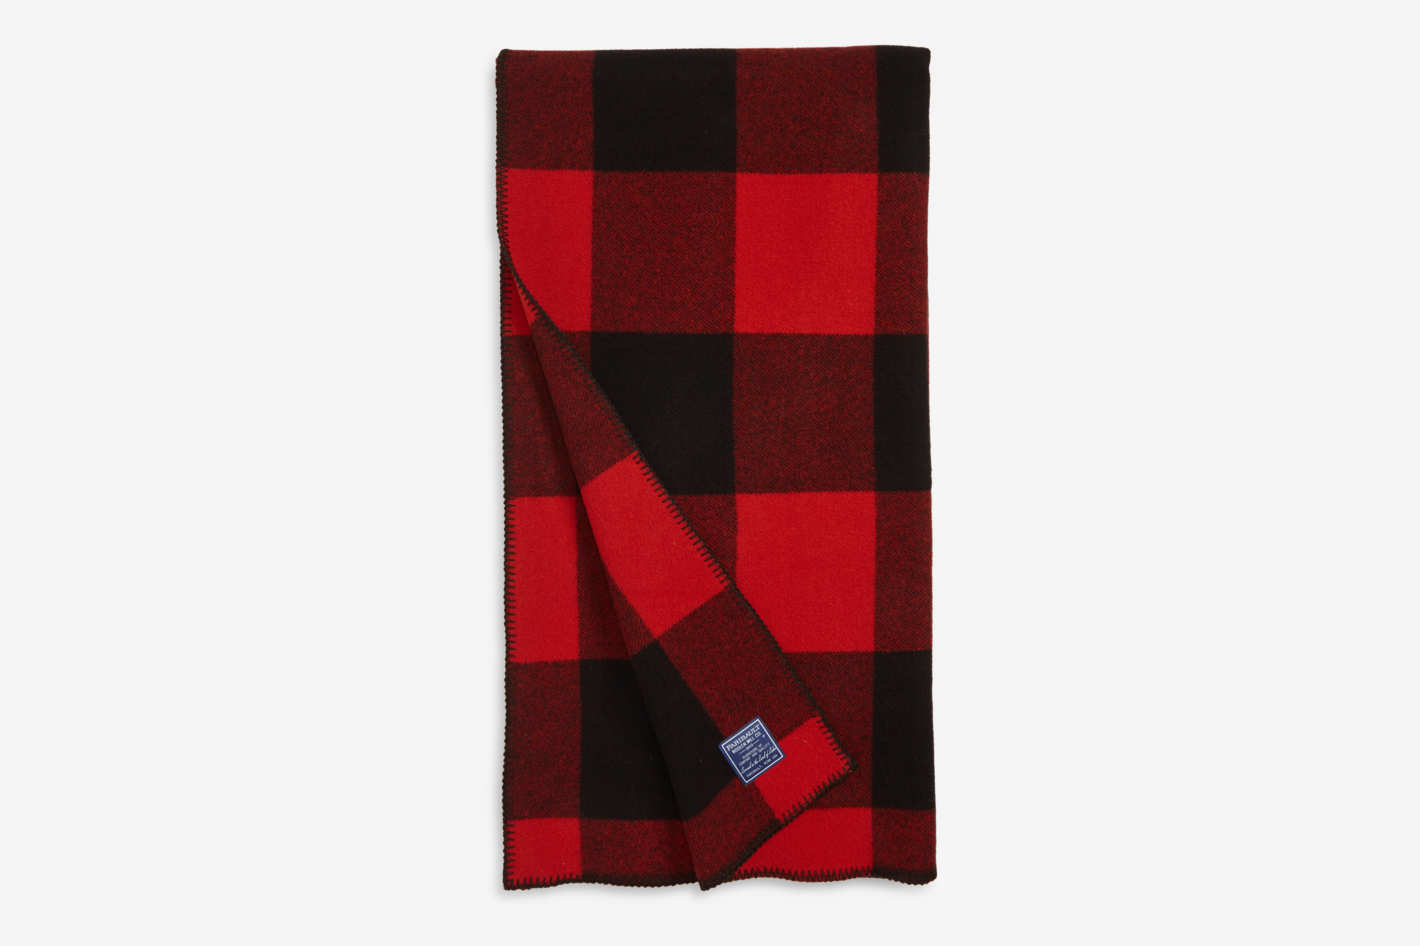 Faribault Woolen Mill Buffalo Plaid Wool Blanket